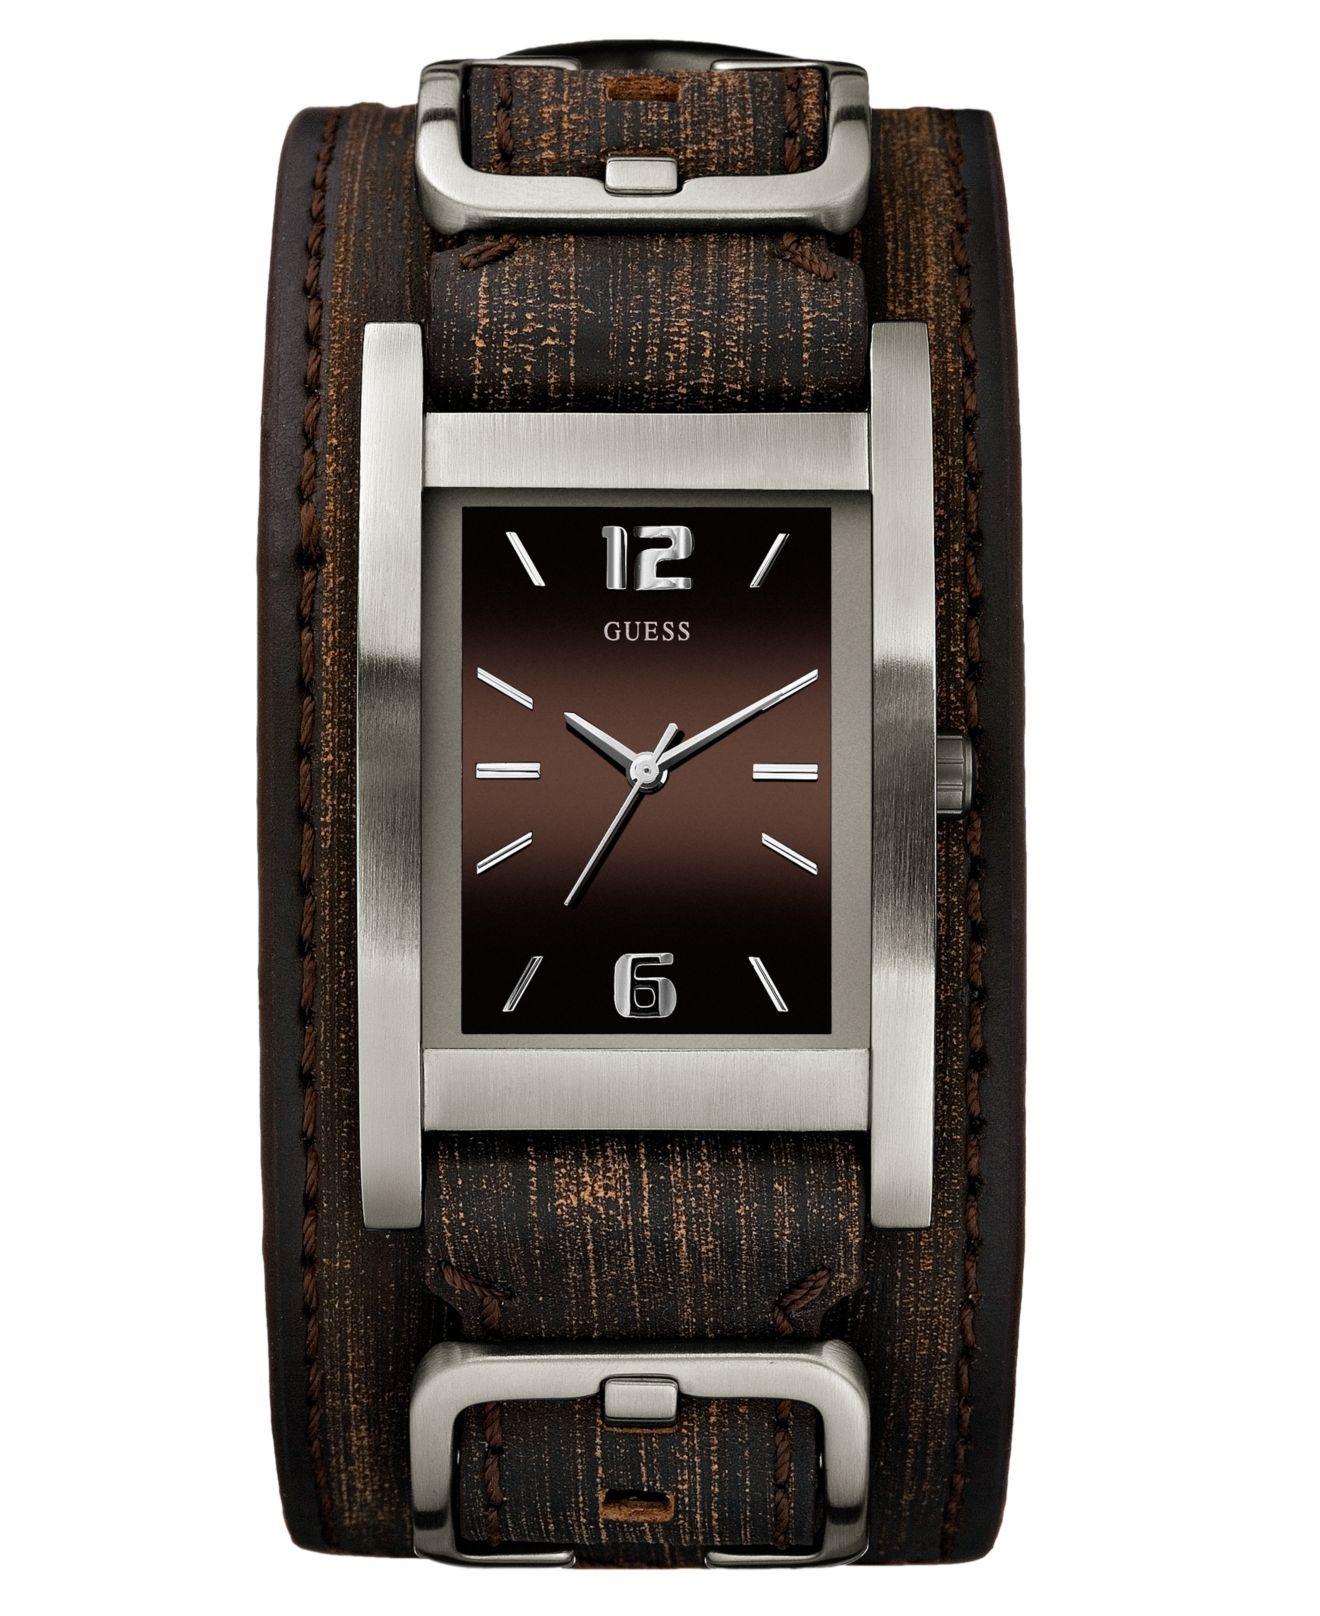 86cb283c8 GUESS Watch, Men's Brown Leather Cuff Bracelet 32x40mm G66391G ...